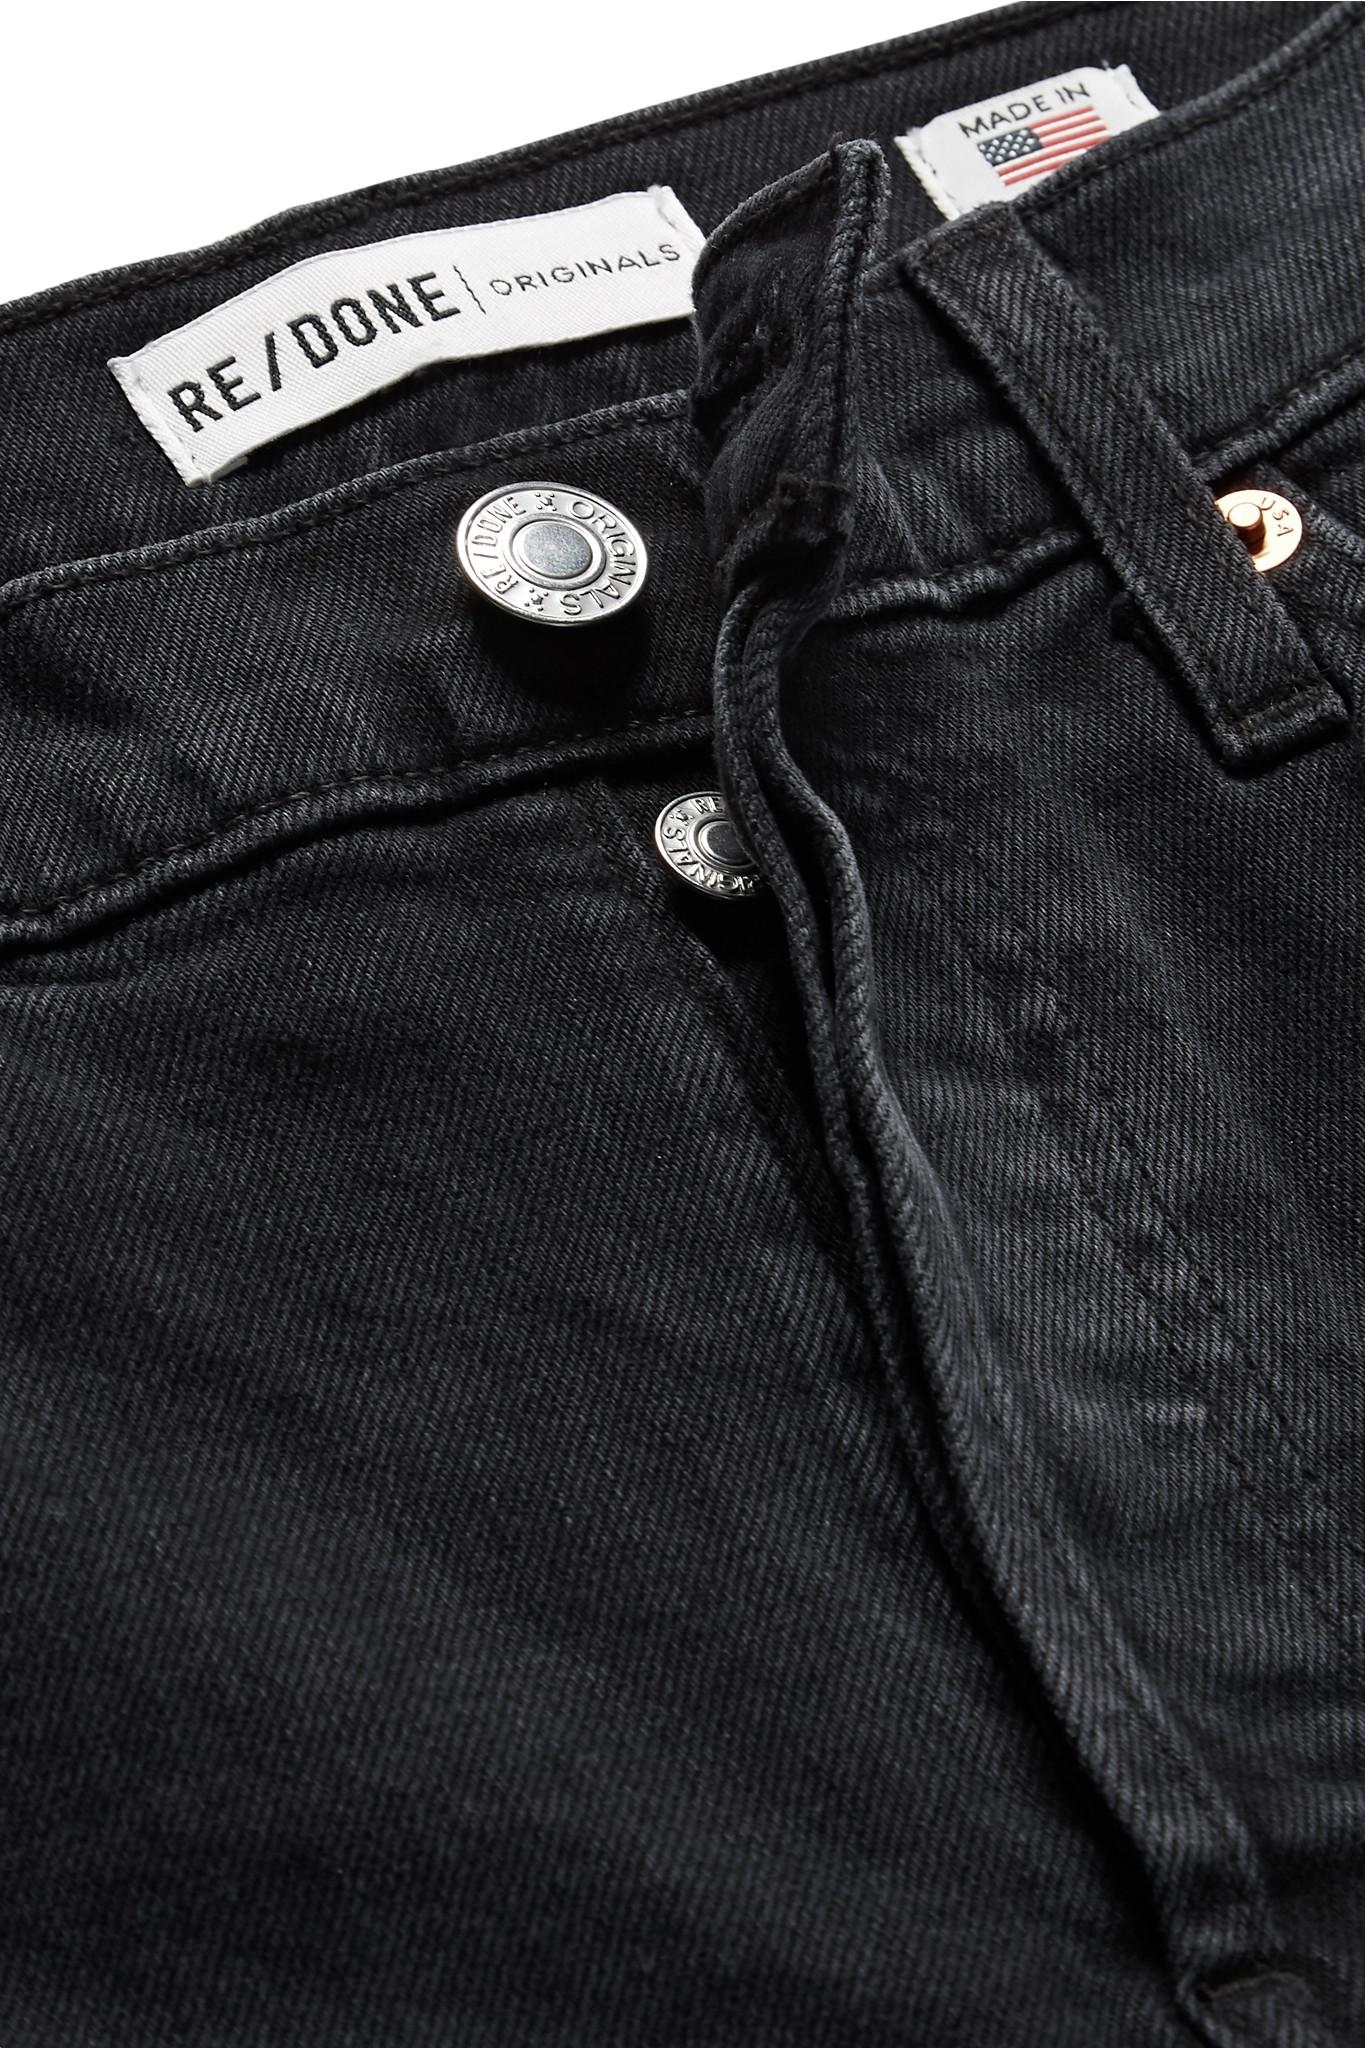 6635b87f1e23e Re done - Black Double Needle Long Frayed High-rise Slim-leg Jeans. View  fullscreen